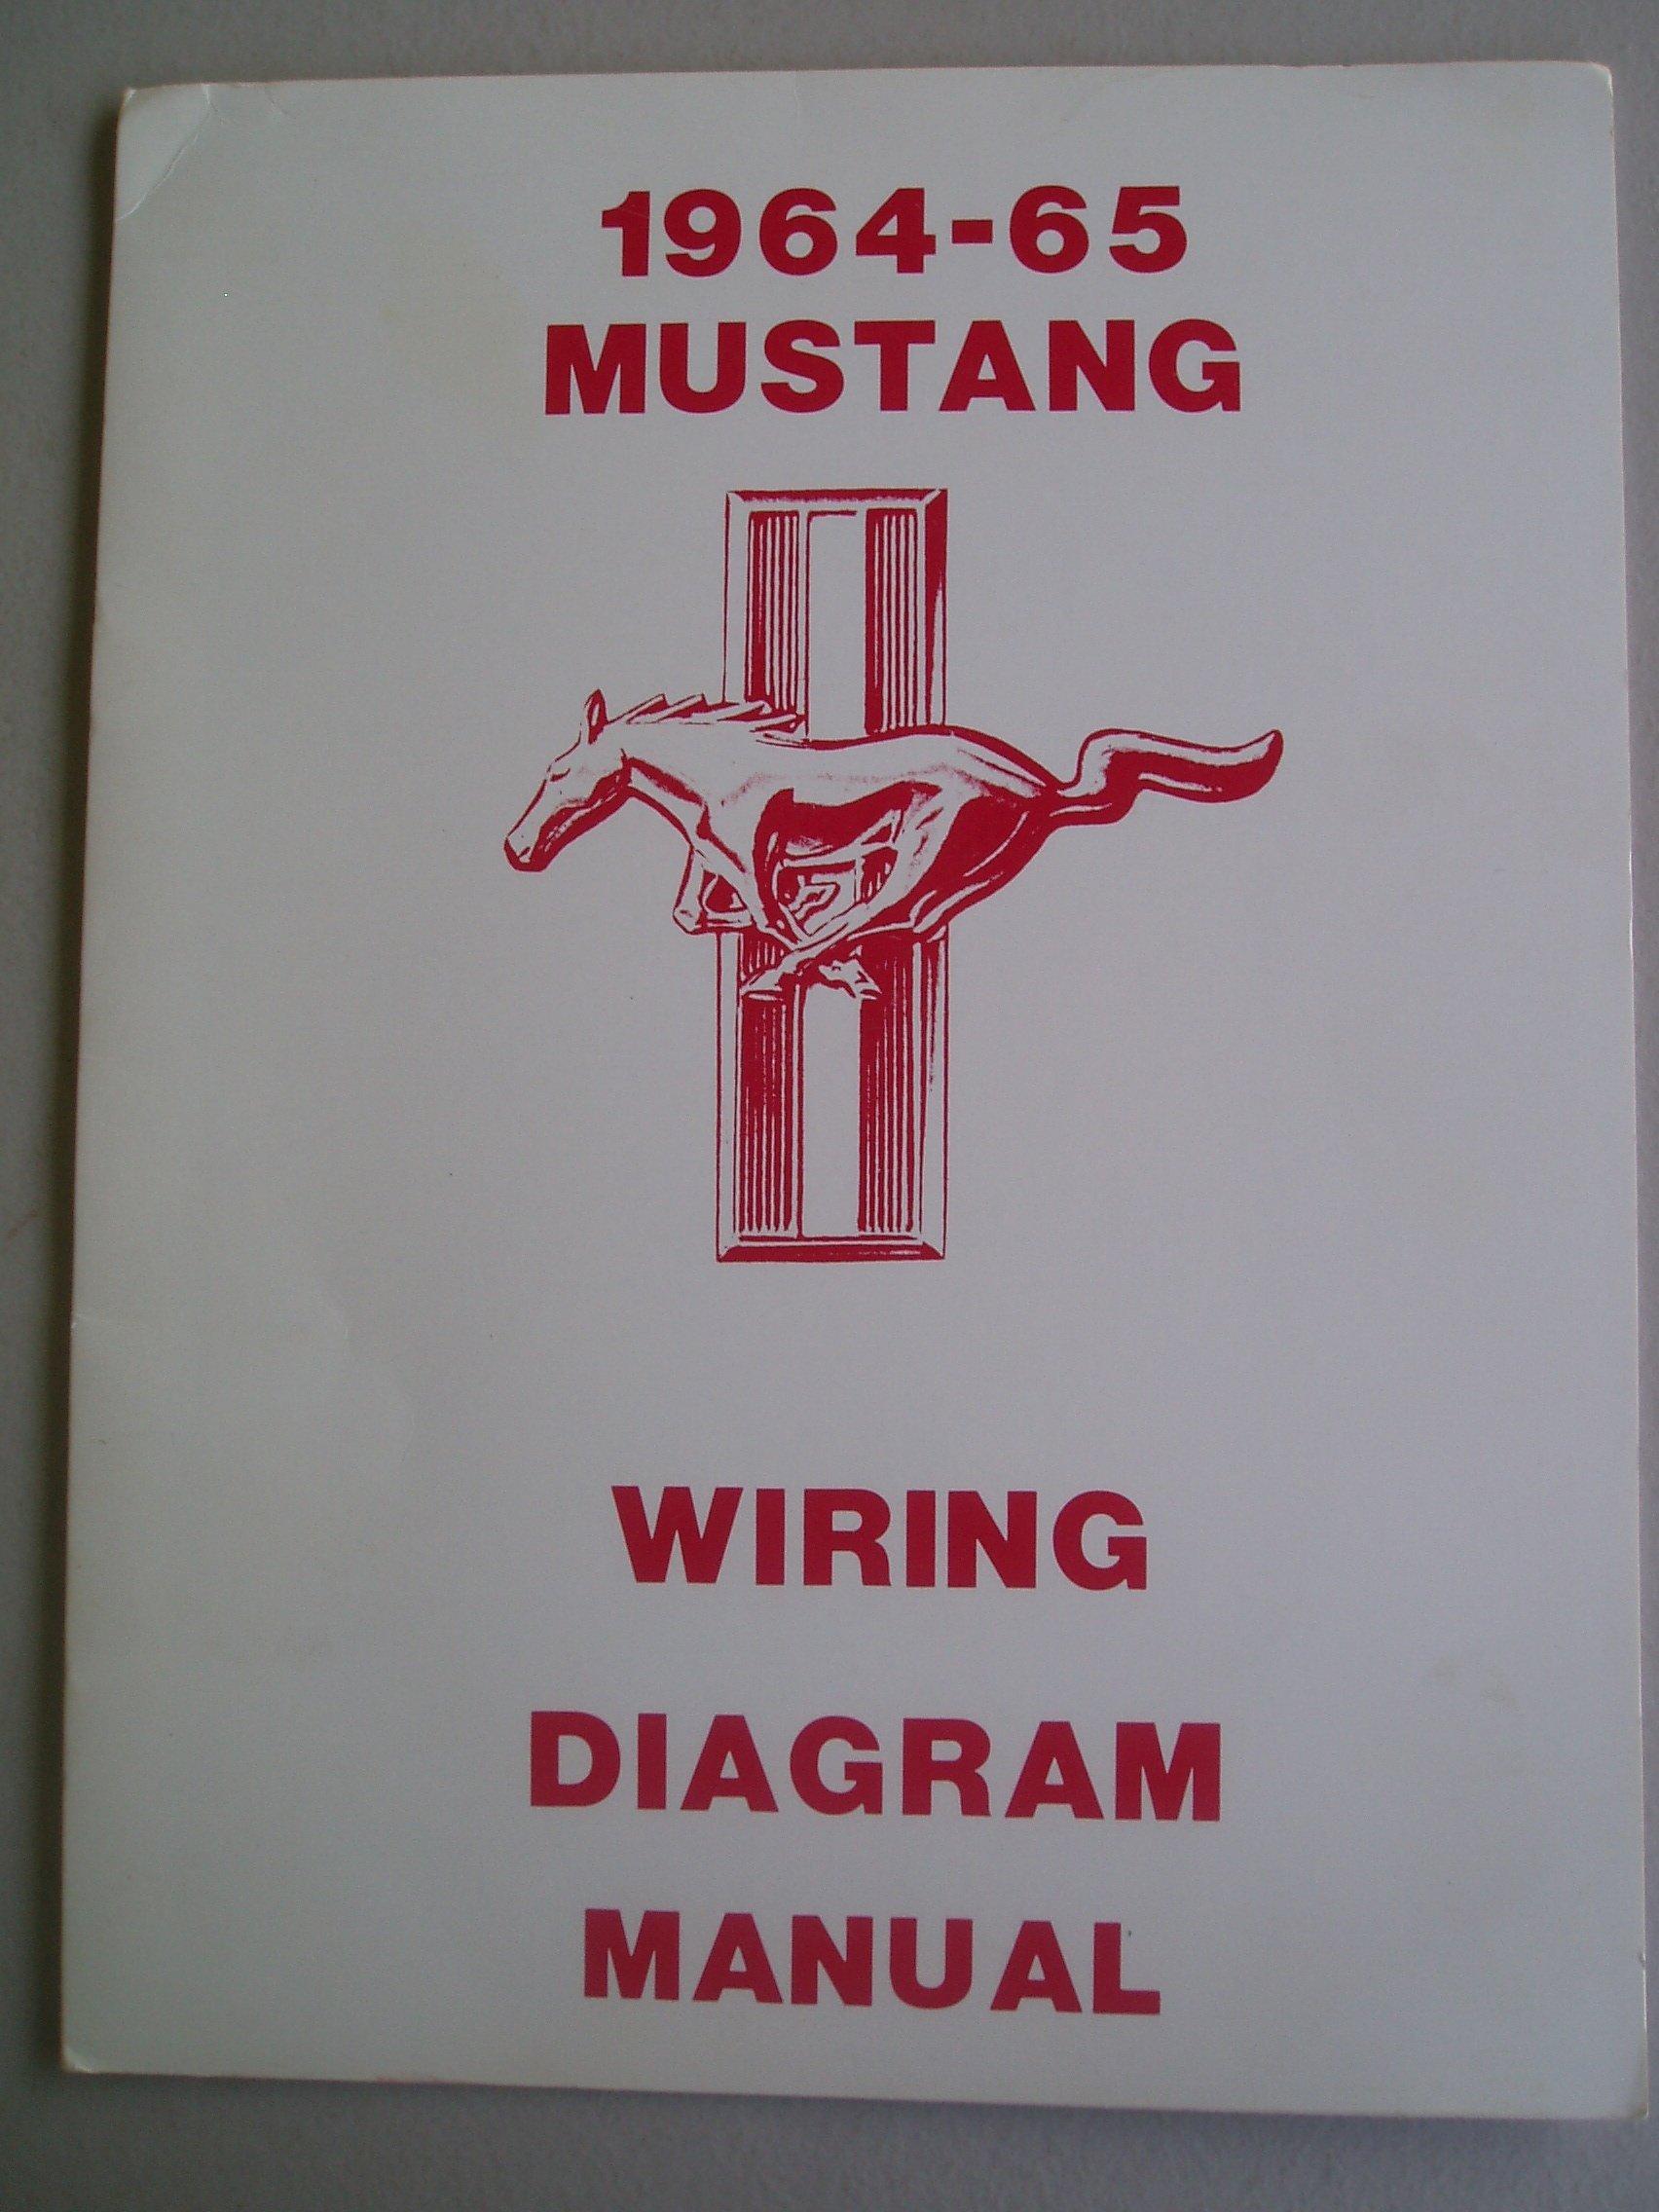 Strange 1964 65 Mustang Wiring Diagram Manual Ford Motor Company Amazon Wiring Digital Resources Nekoutcompassionincorg